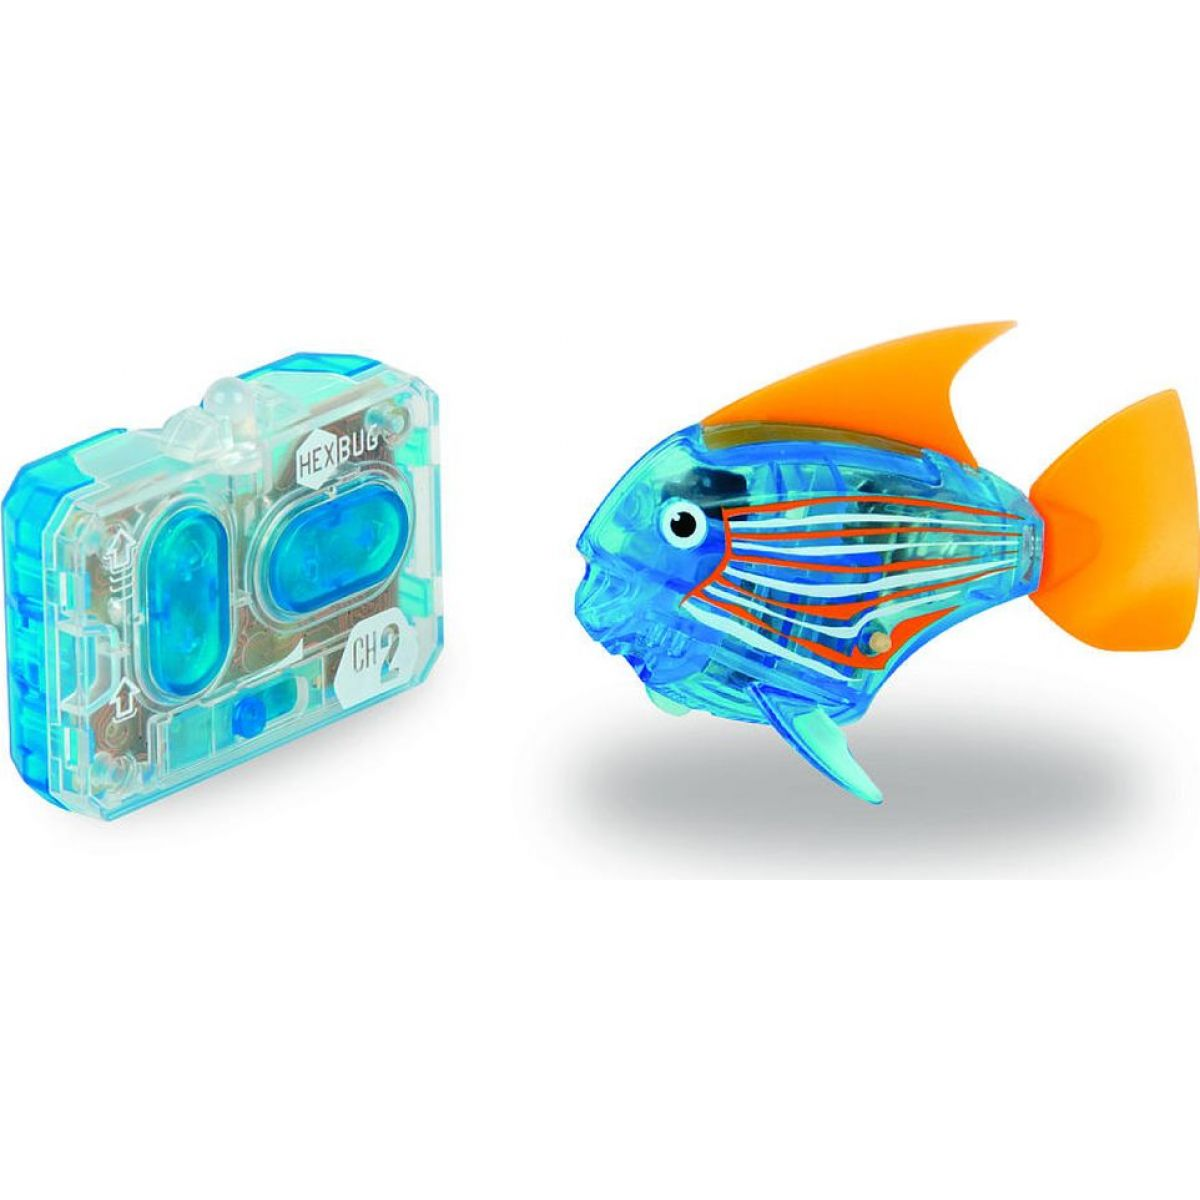 Hexbug Aguabot 3.0 IR - Modrý